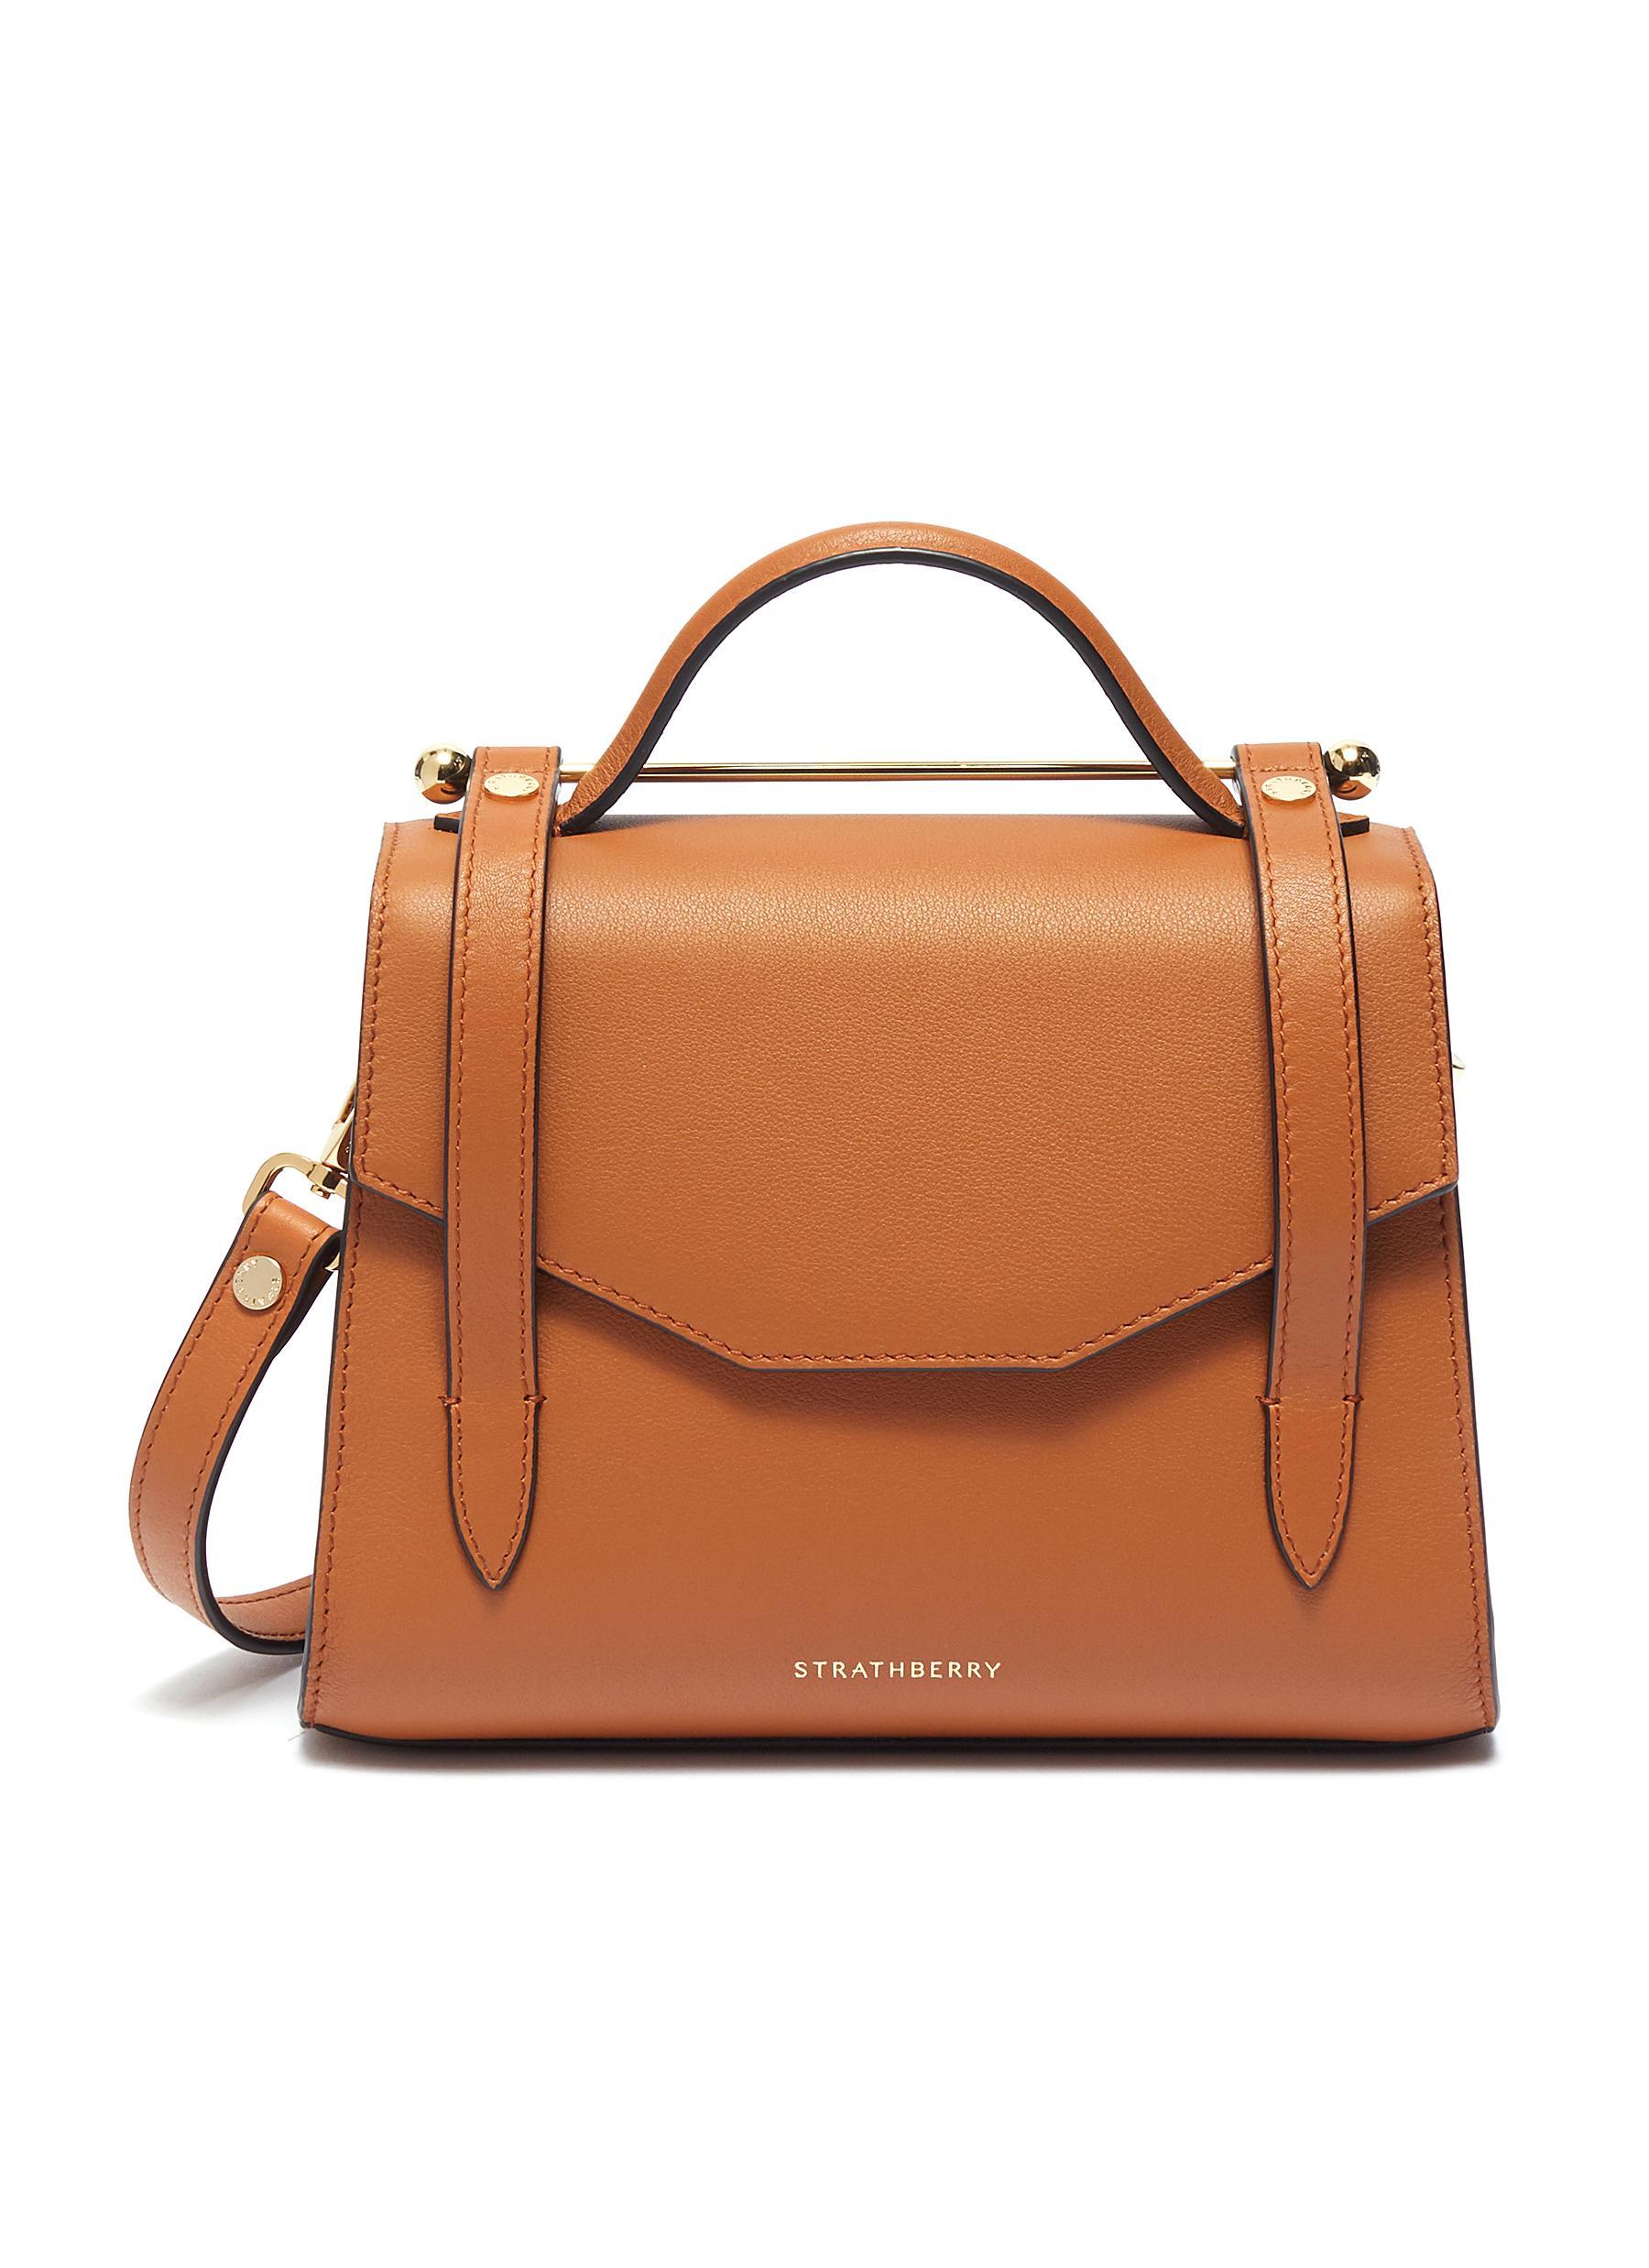 Strathberry 'Allegro Mini' Leather Satchel In Tan